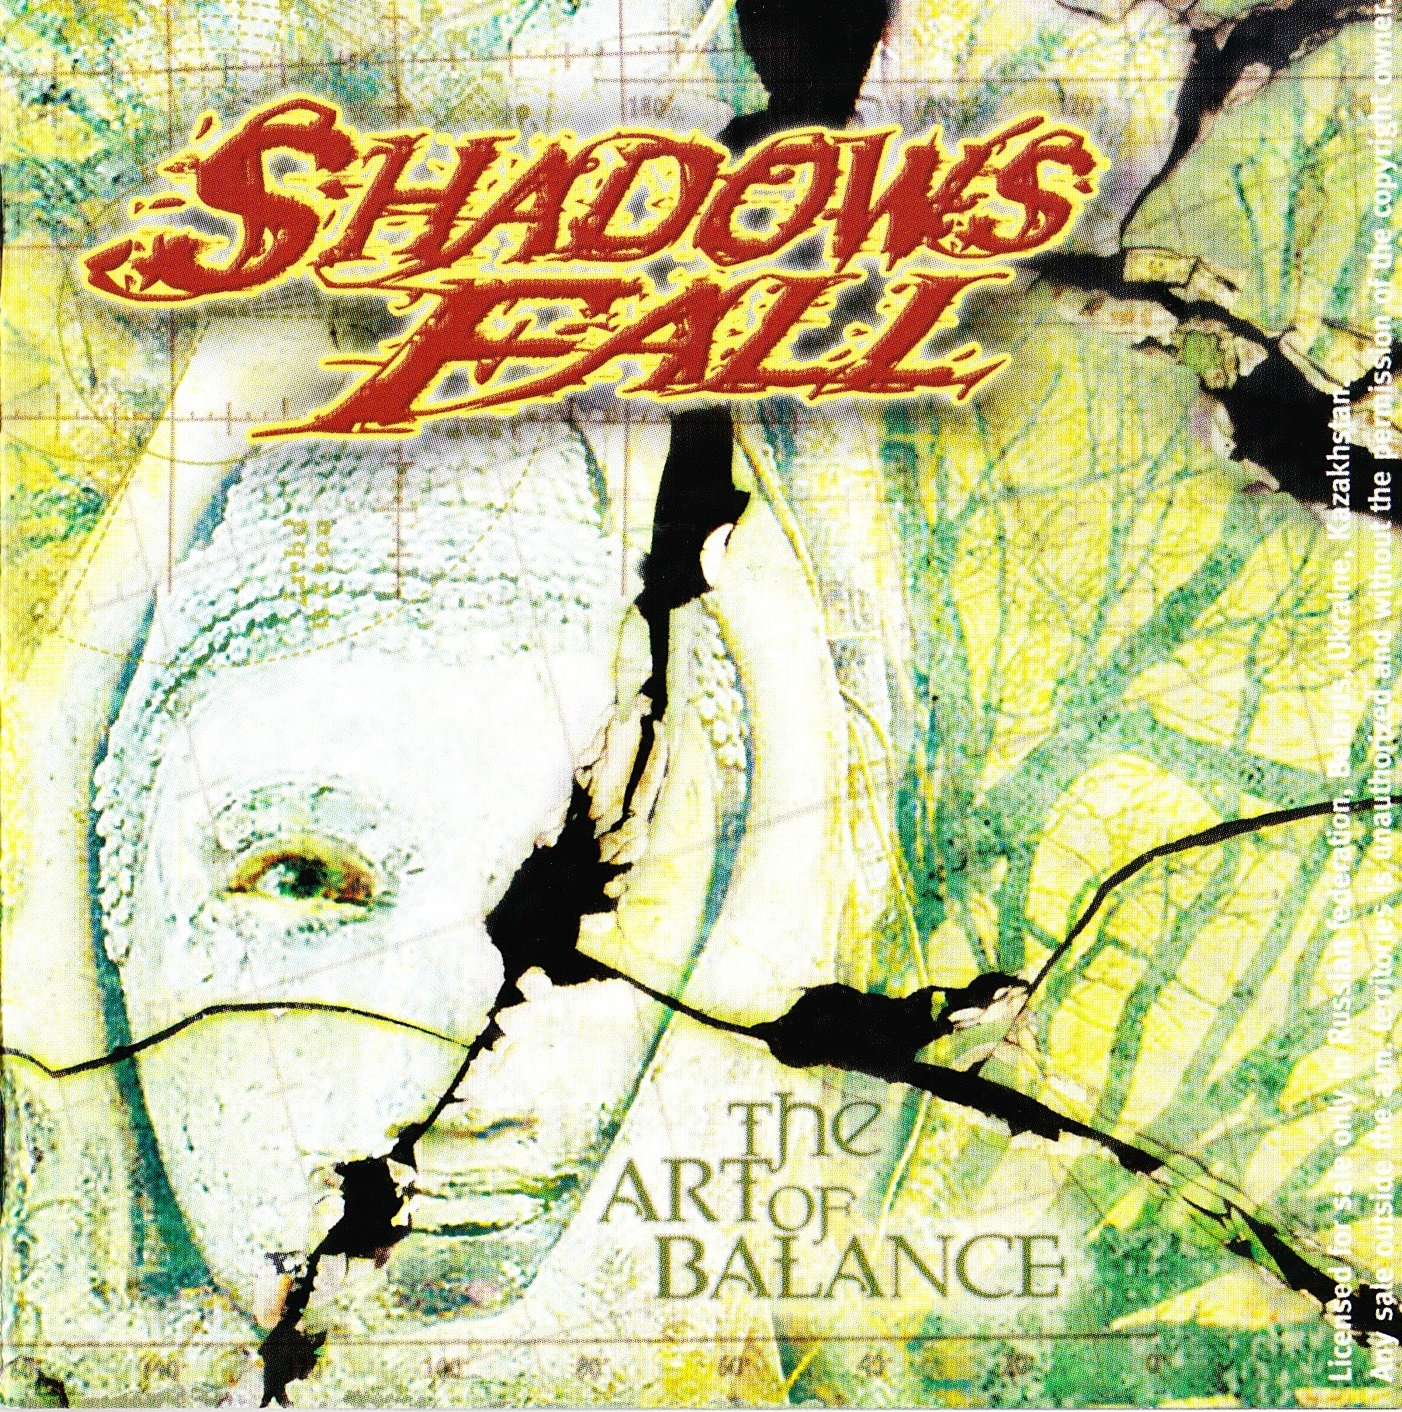 Shadows Fall — The Art Of Balance (2002)